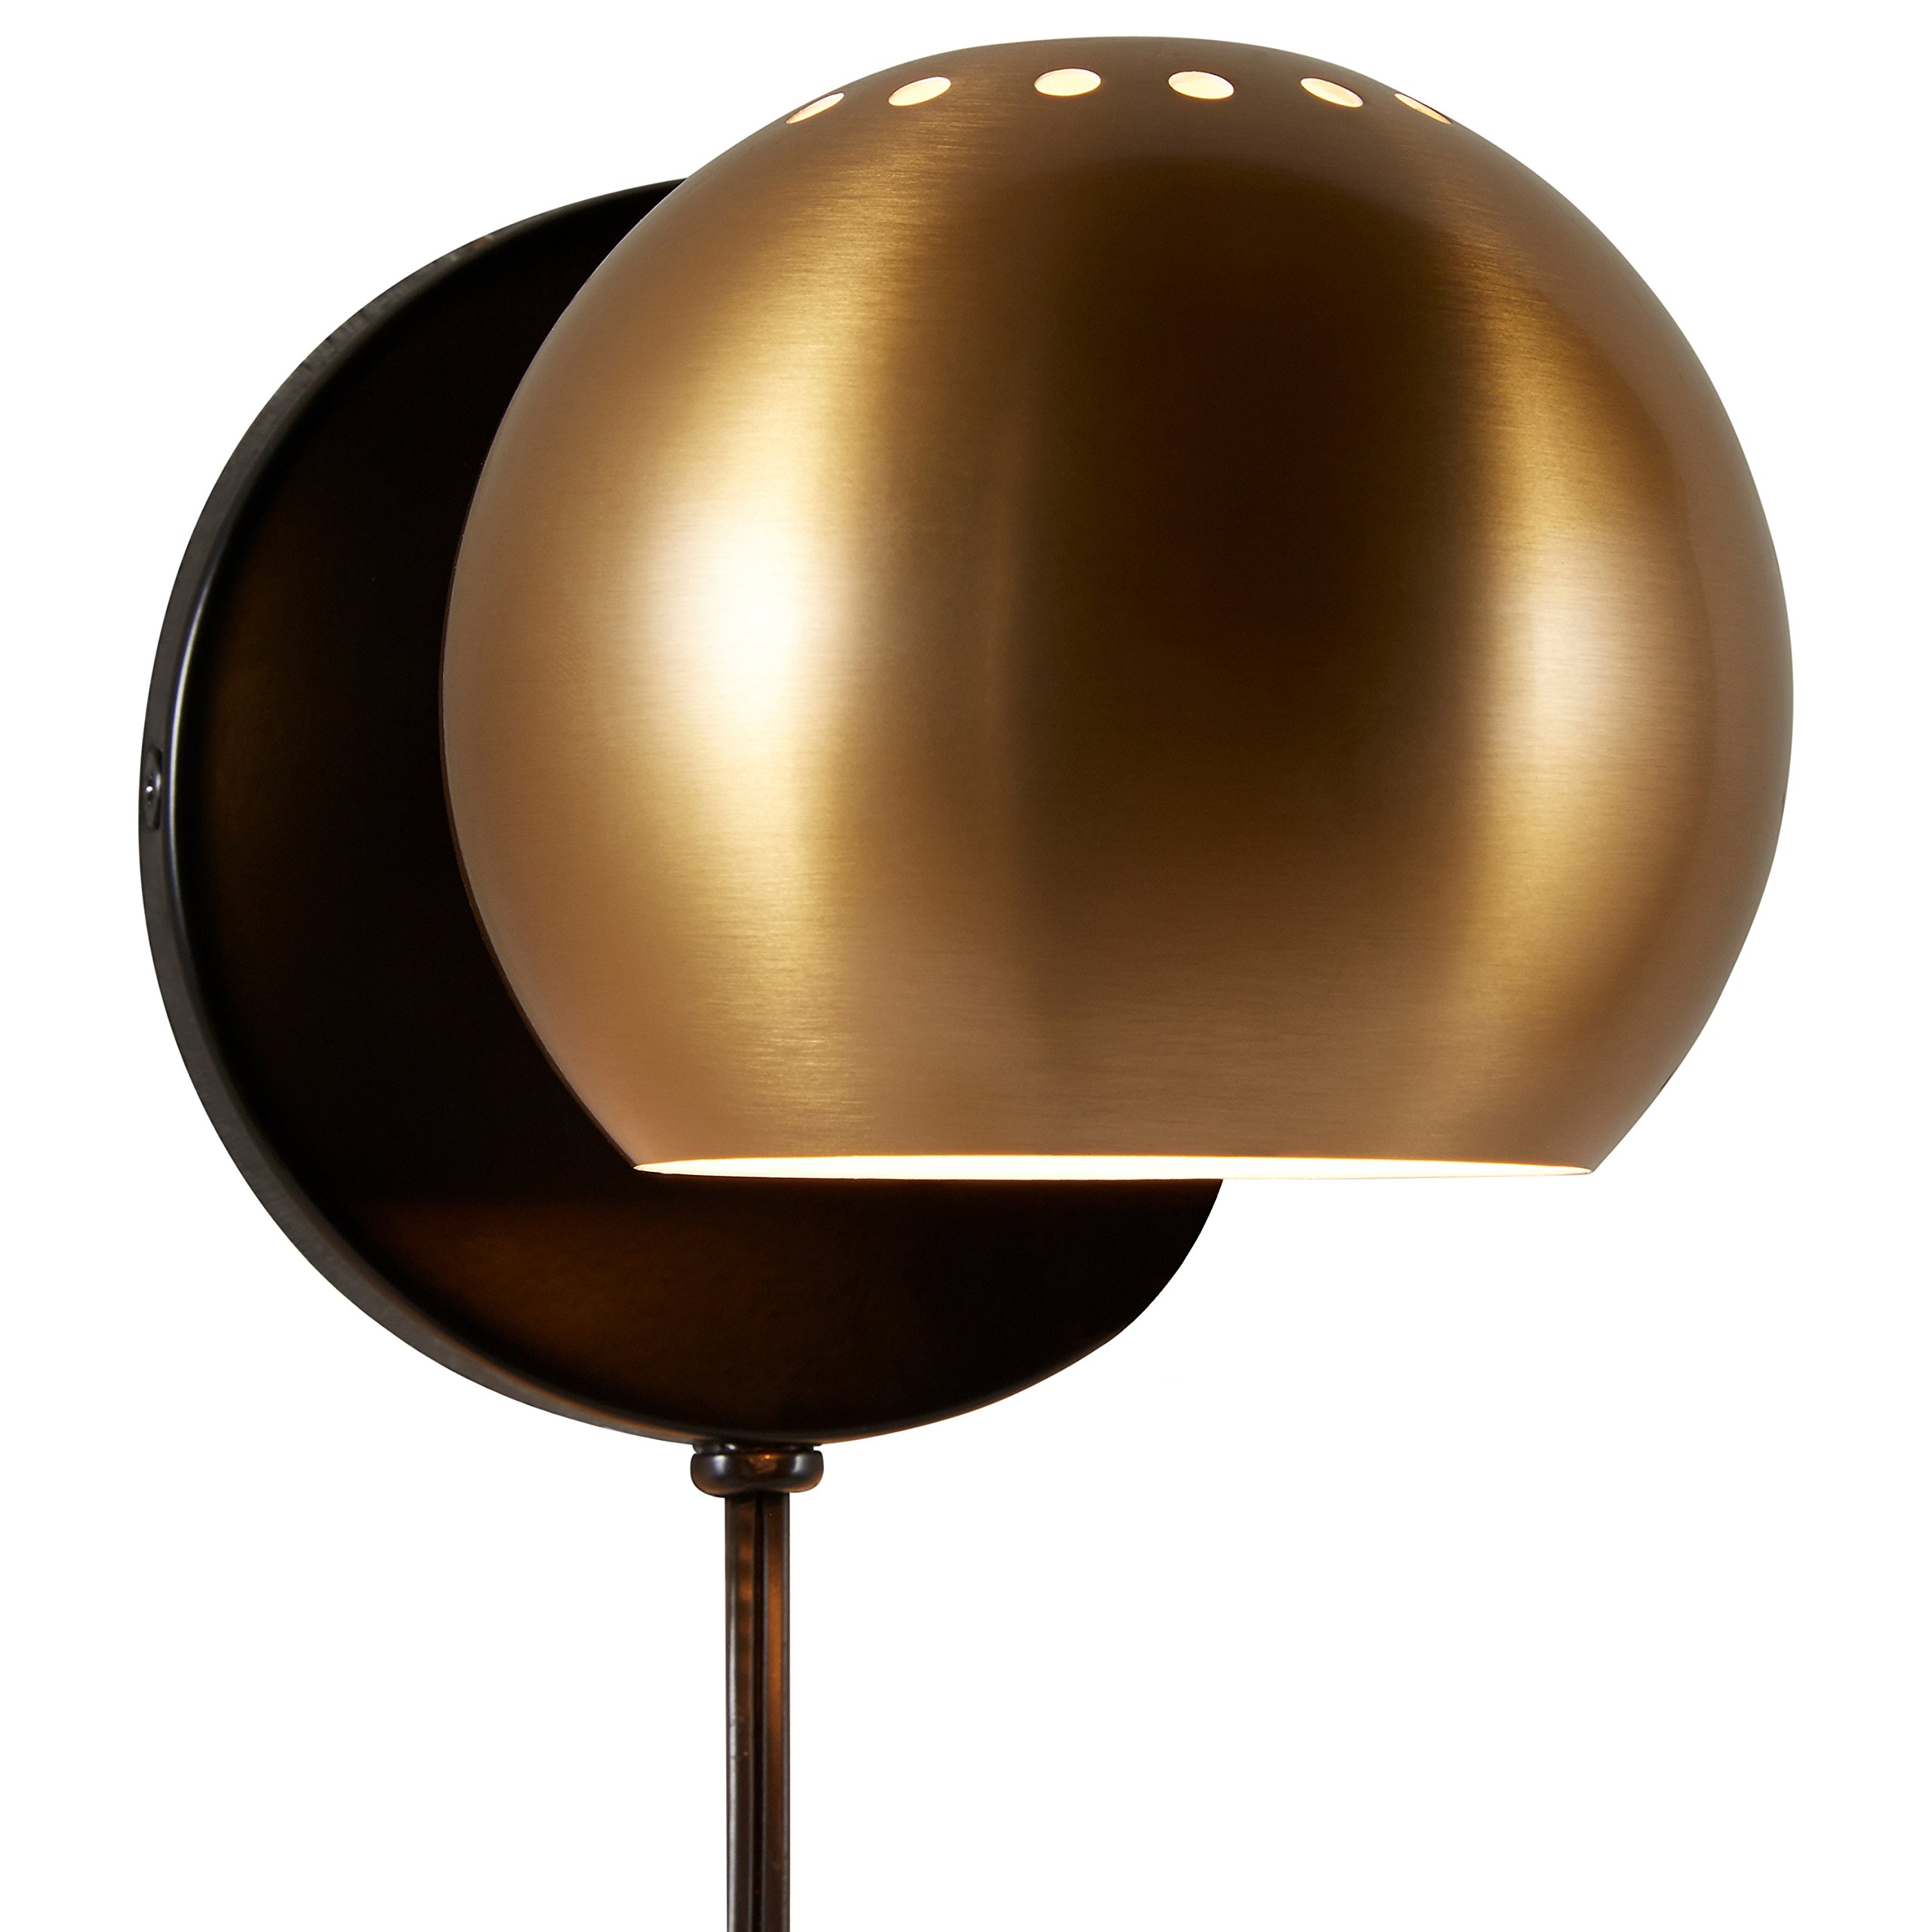 Rivet Gold Metal Plug-in Wall Sconce Light, 7'' H, Gold Metal by Rivet